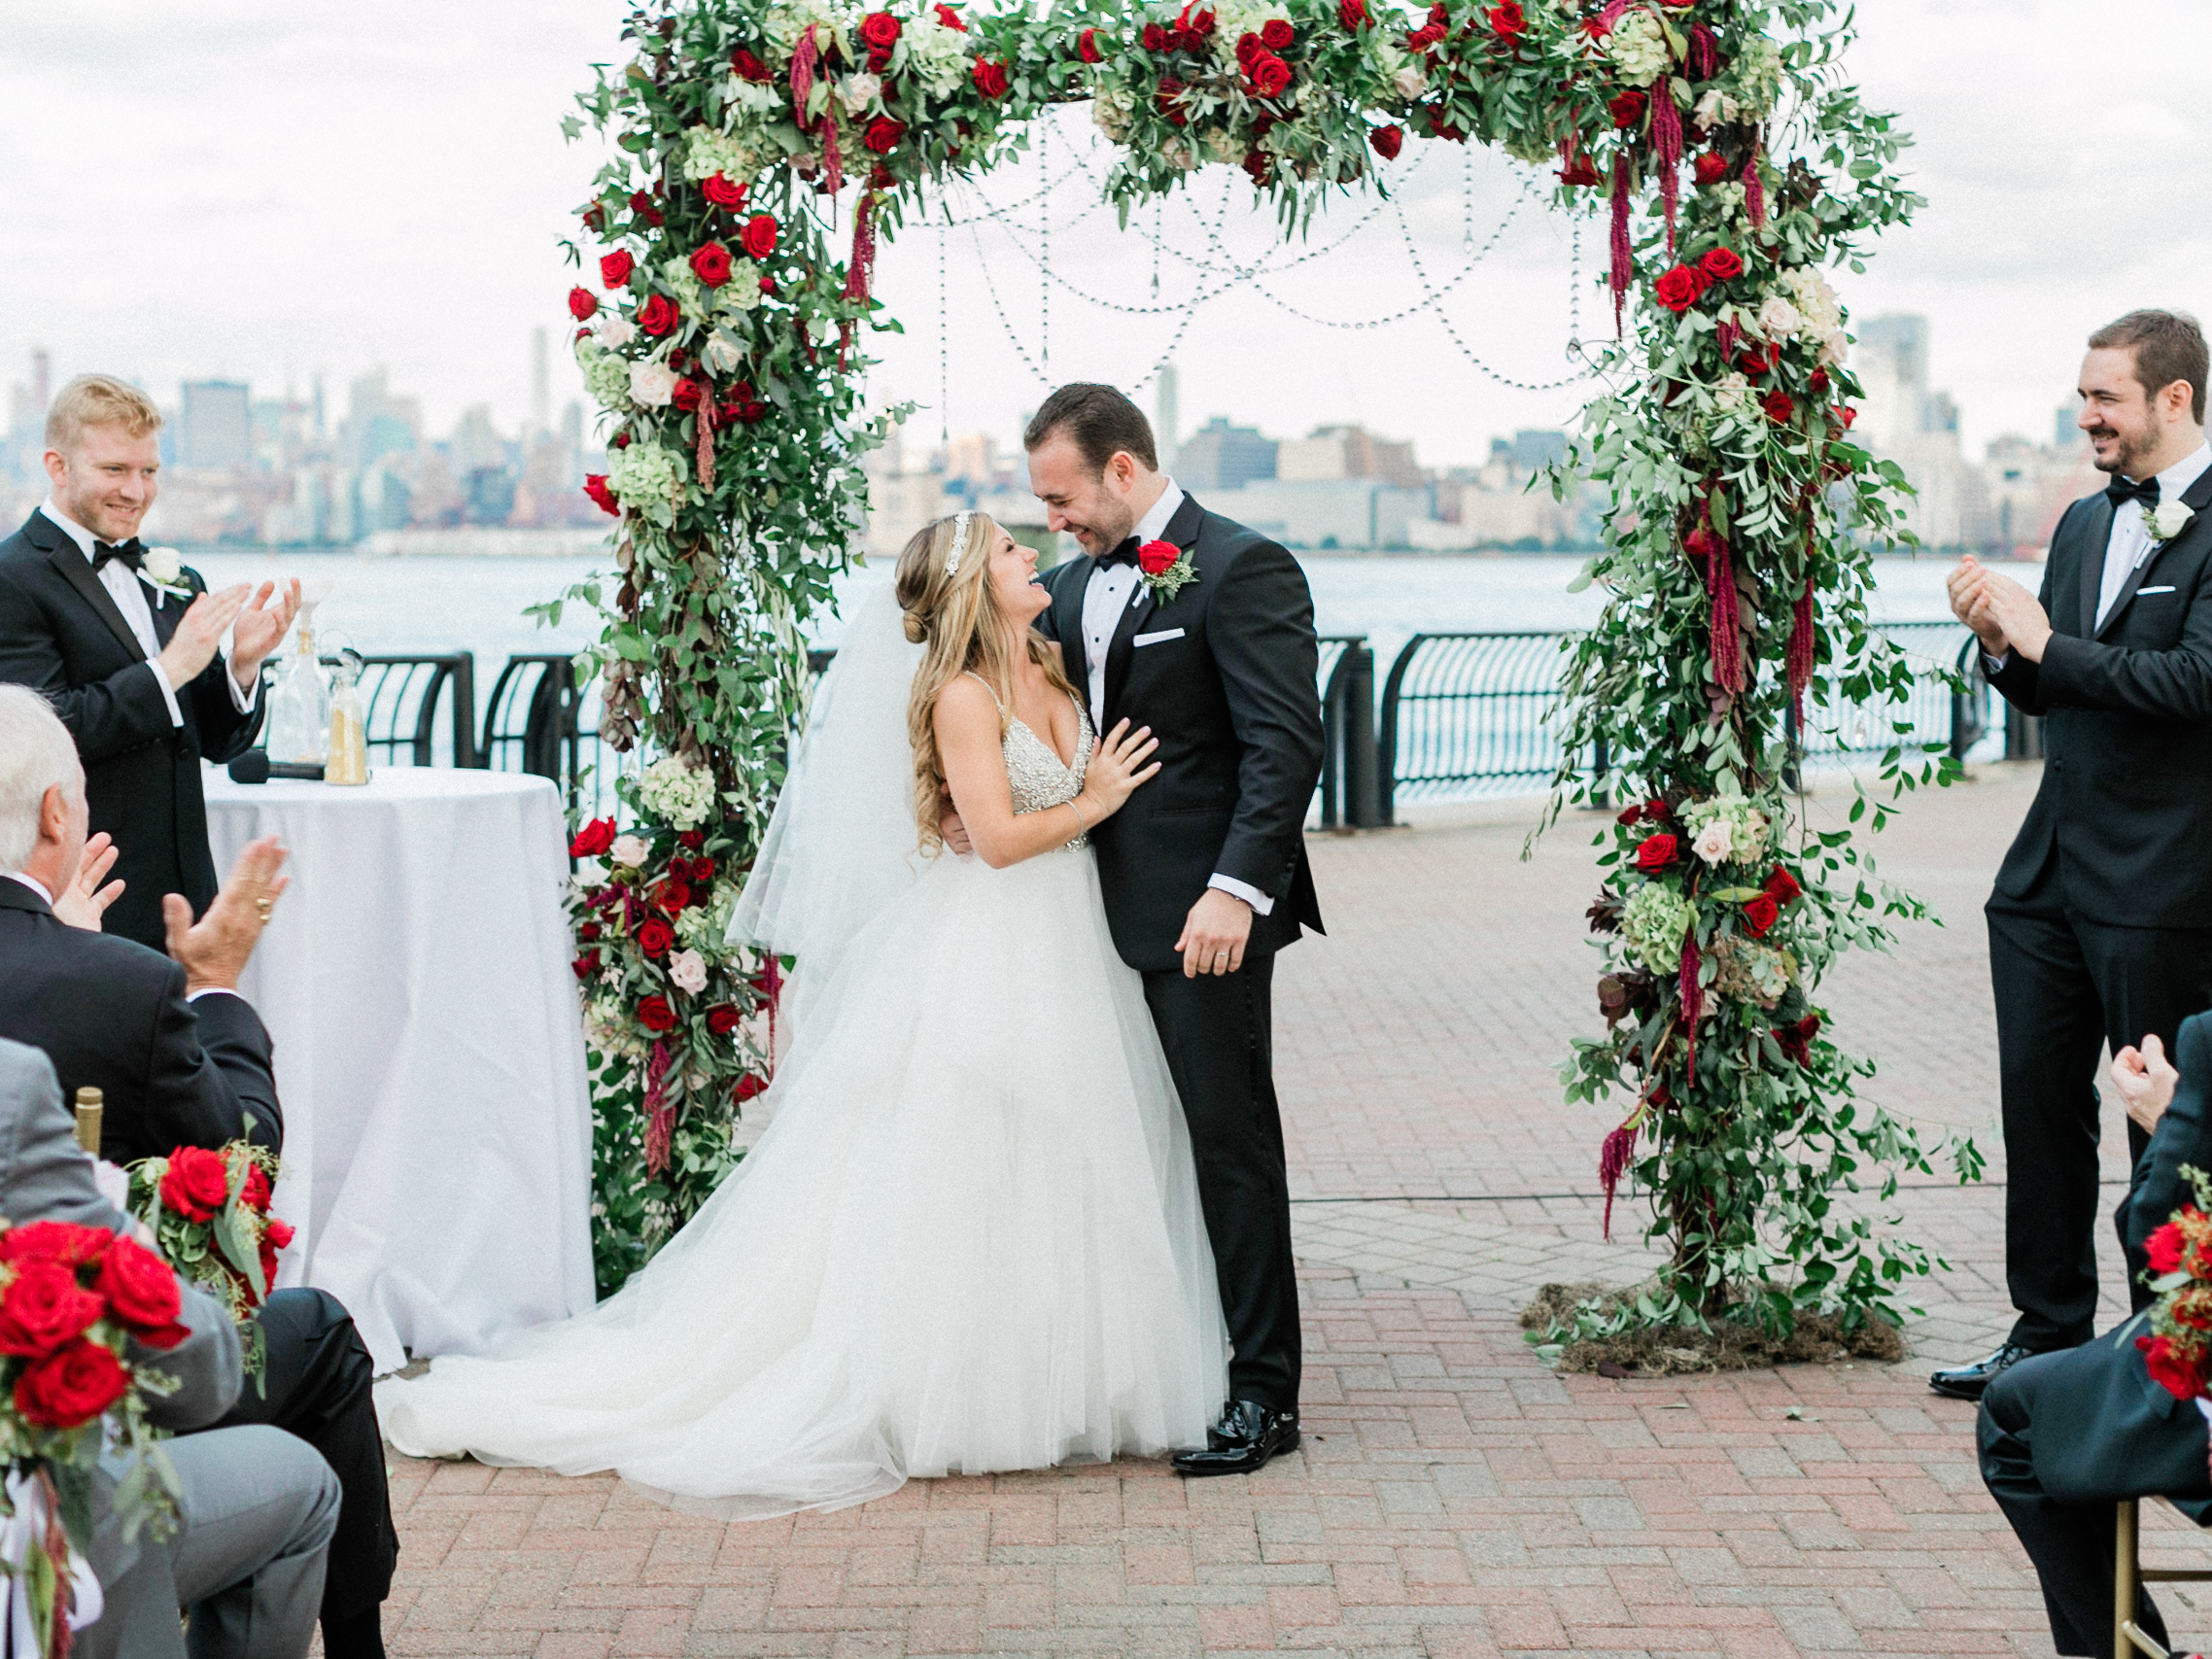 hyatt-regency-jersey-city-wedding-photographer48.jpg